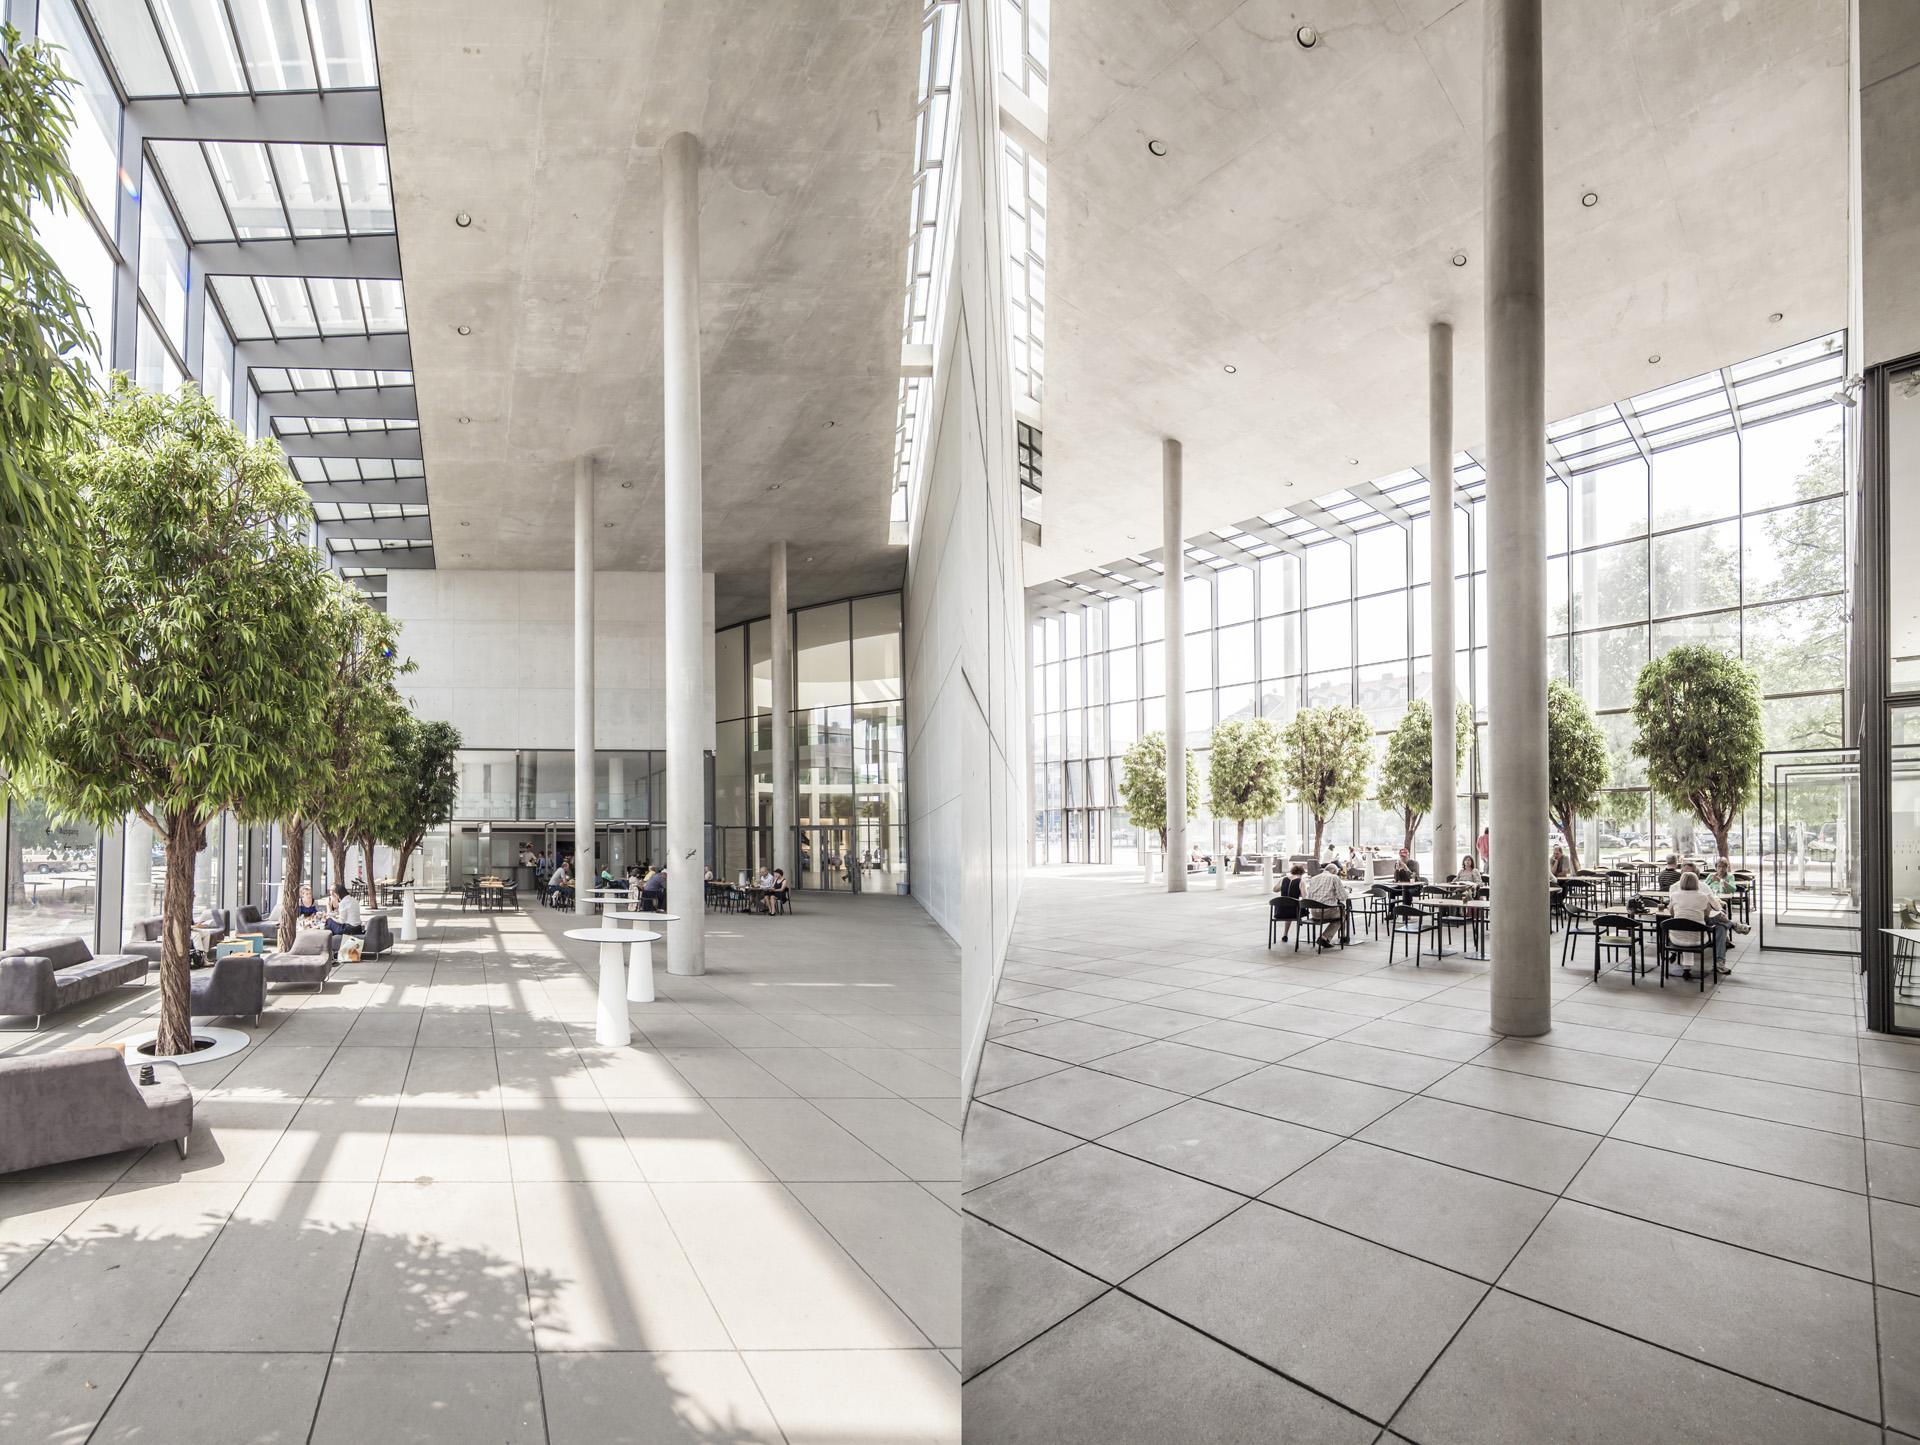 IMG 2643 - Pinakothek der Moderne